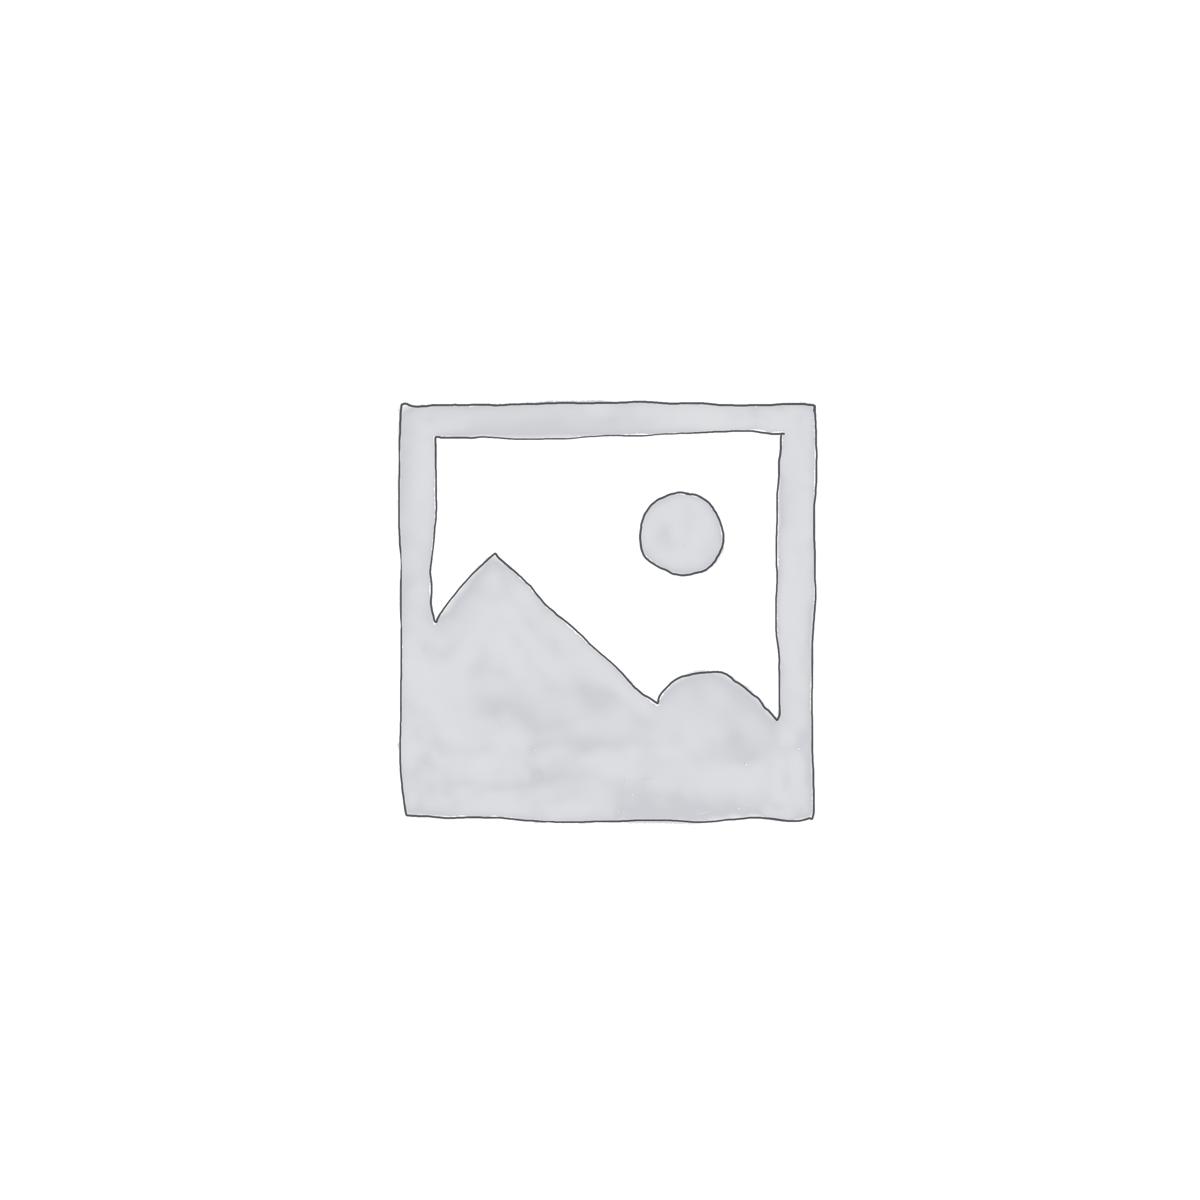 Kids World Map with Famous Landmarks Wallpaper Mural